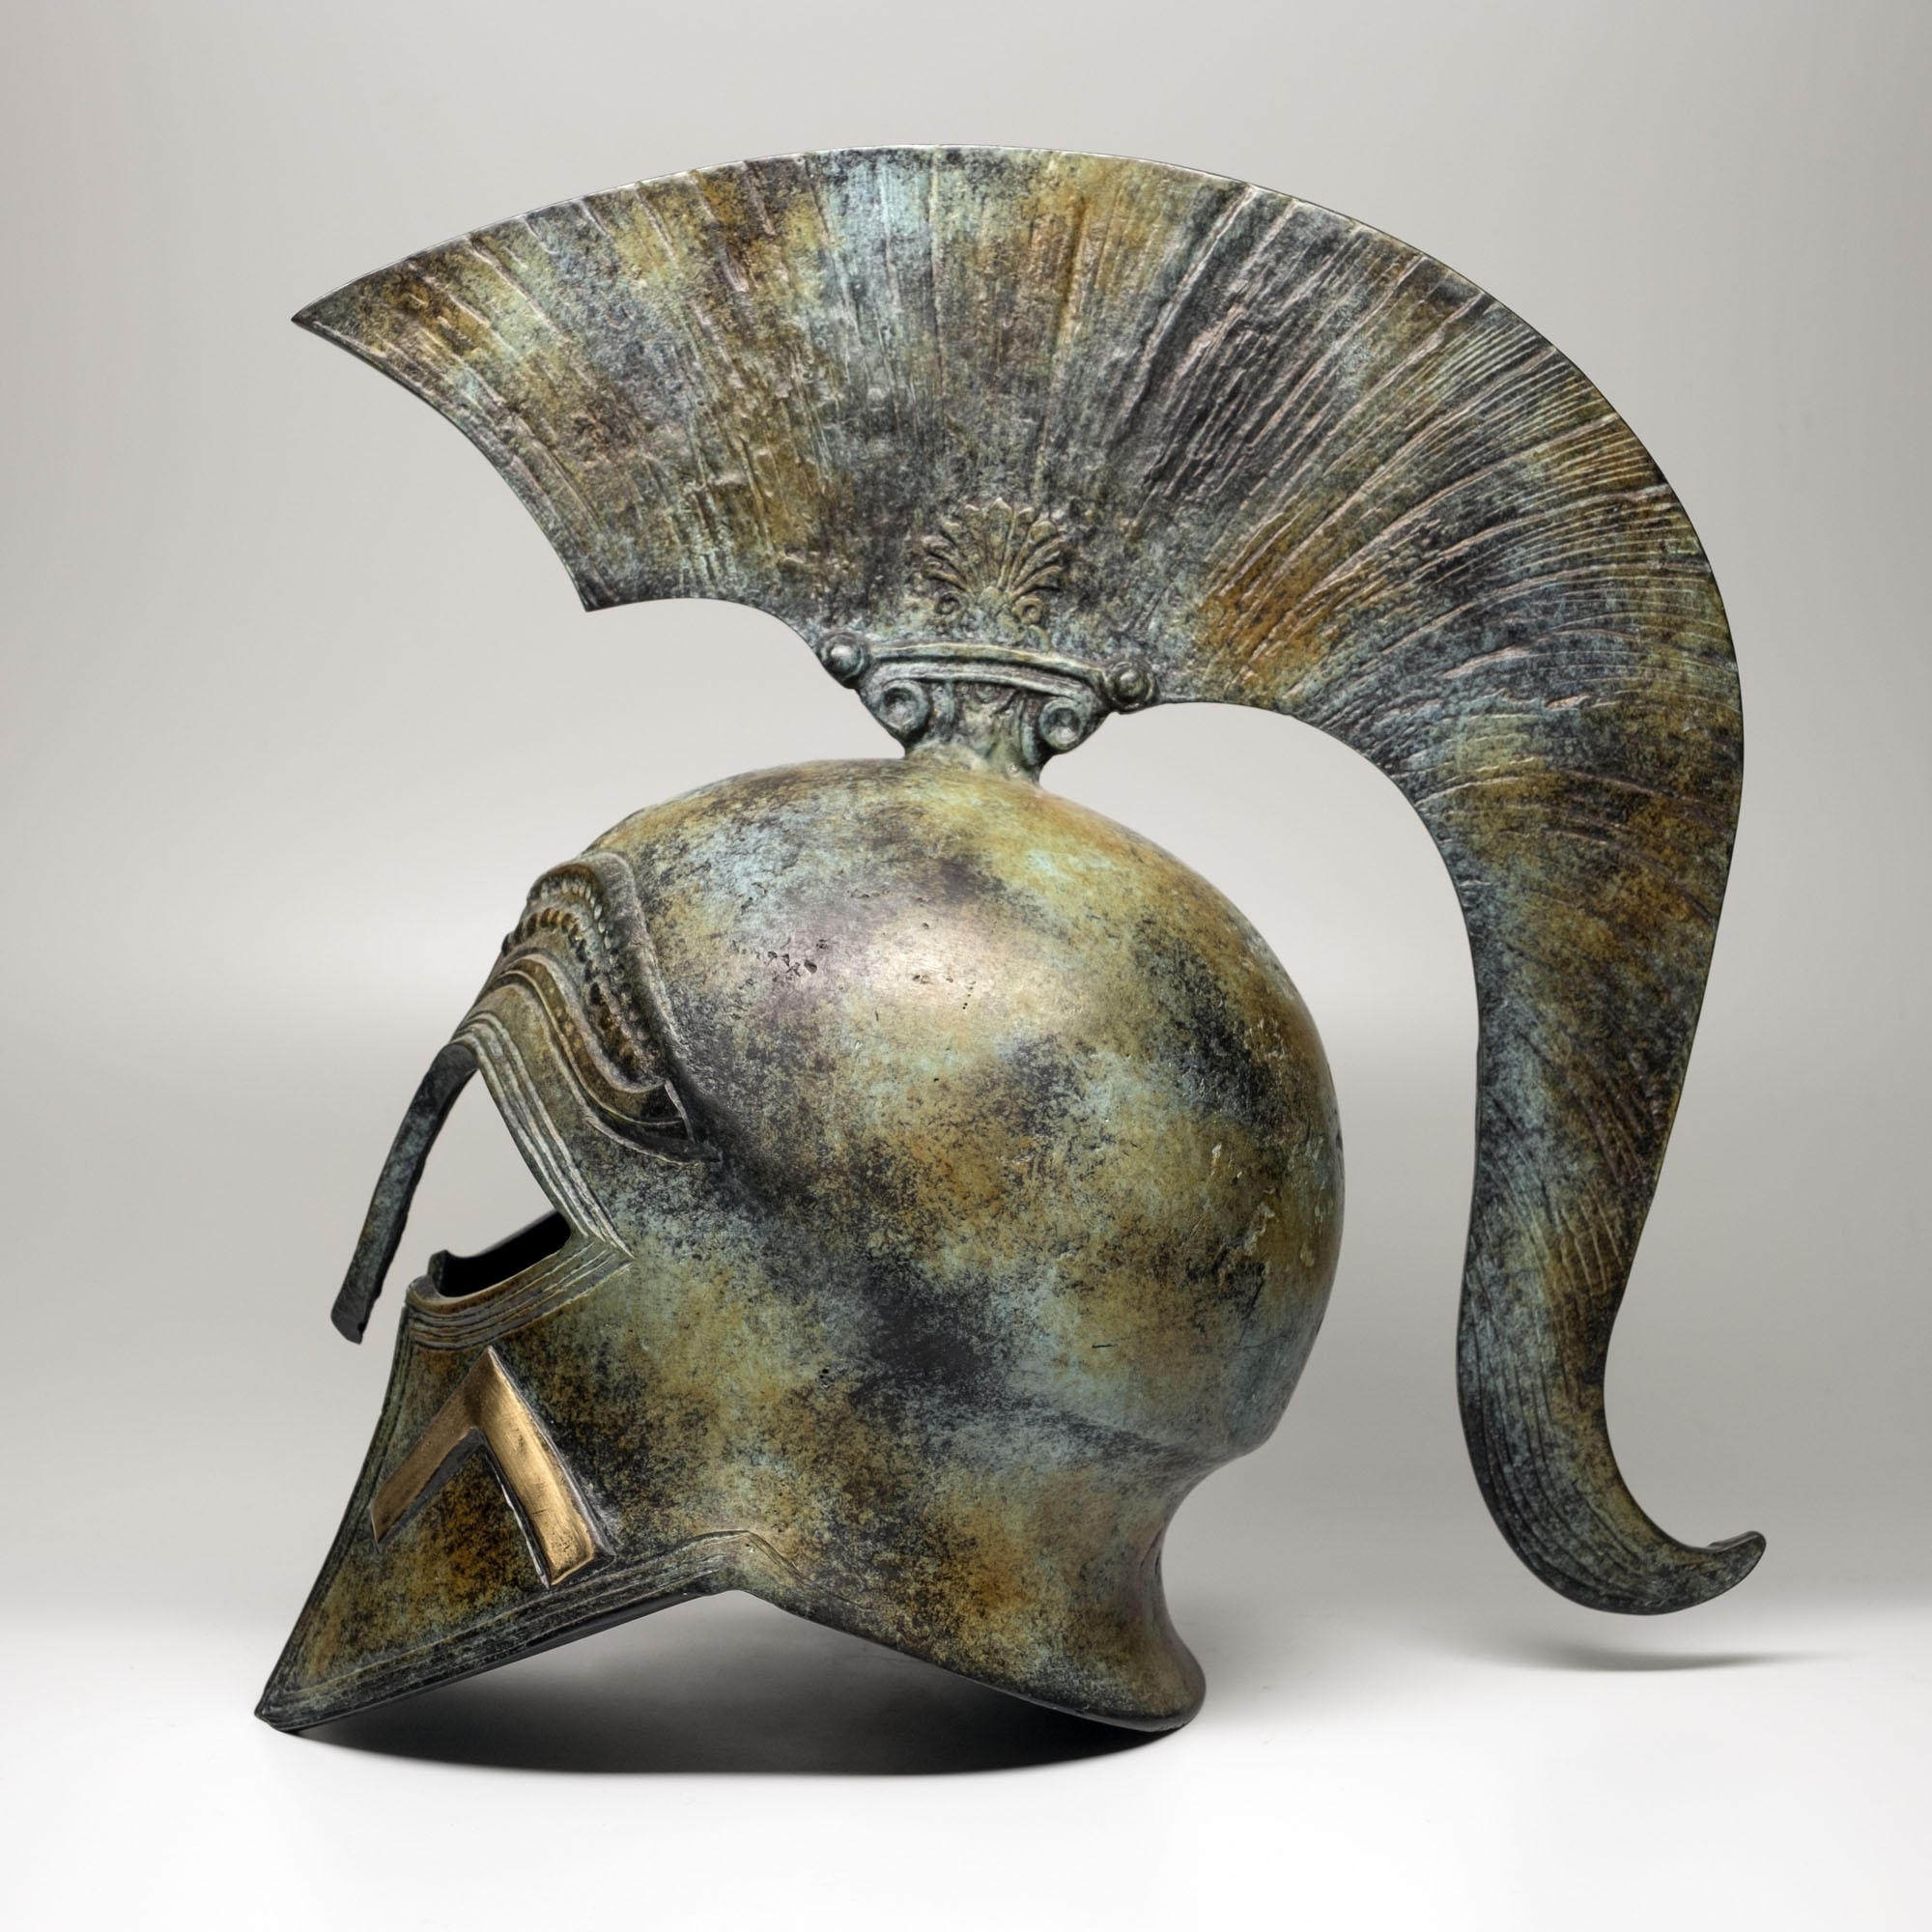 Spartan-Style Helmet Handmade Oxidized Bronze (28cm/11.02'' Tall)